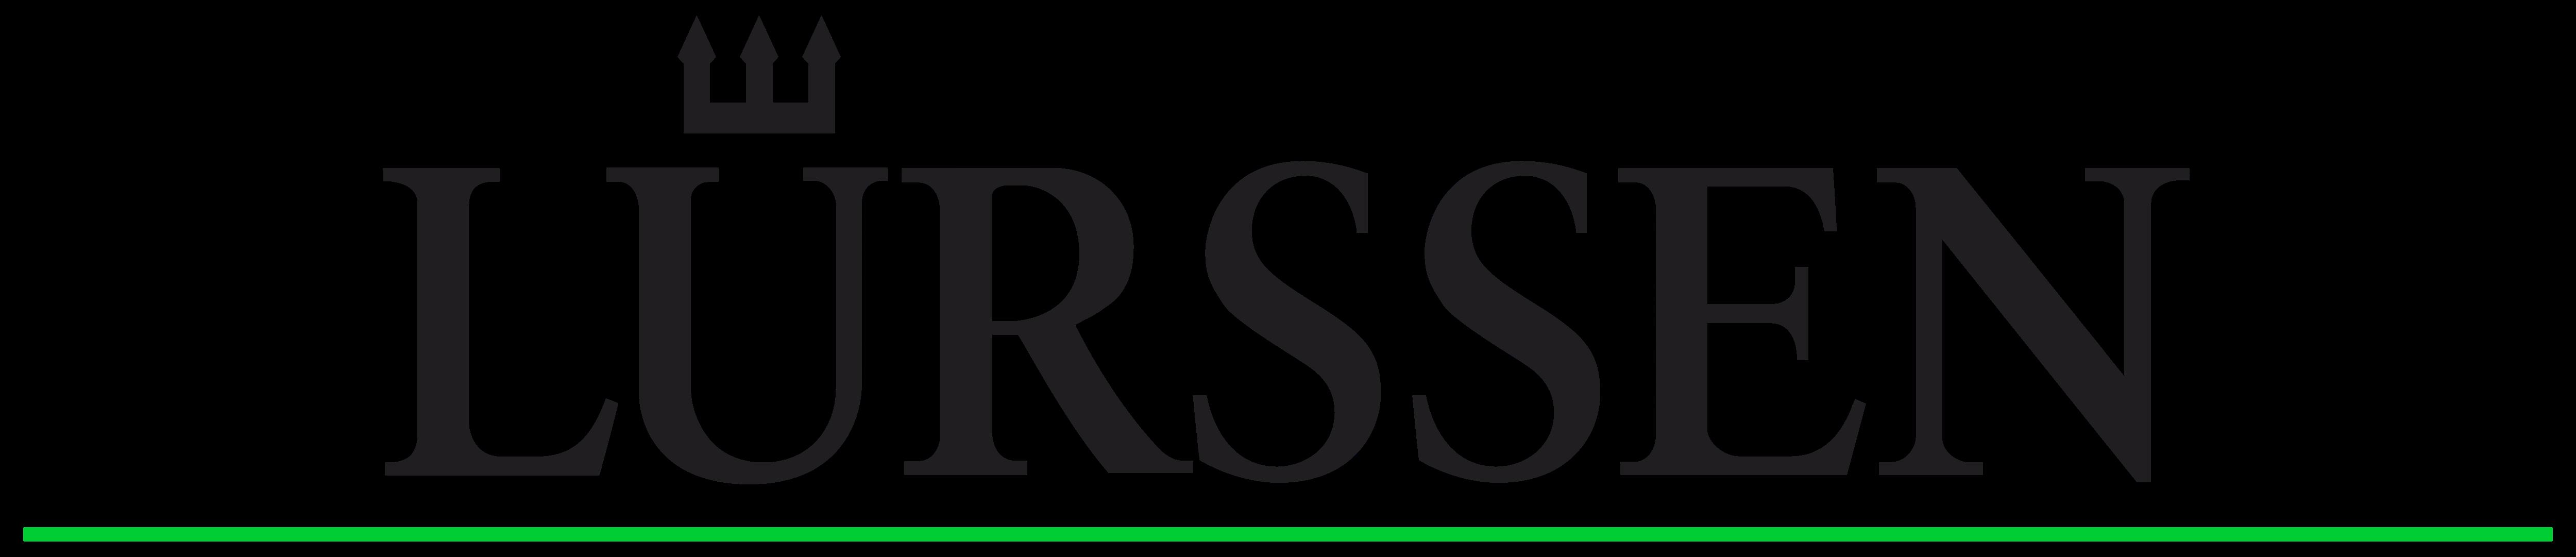 Lrssen Logos Download